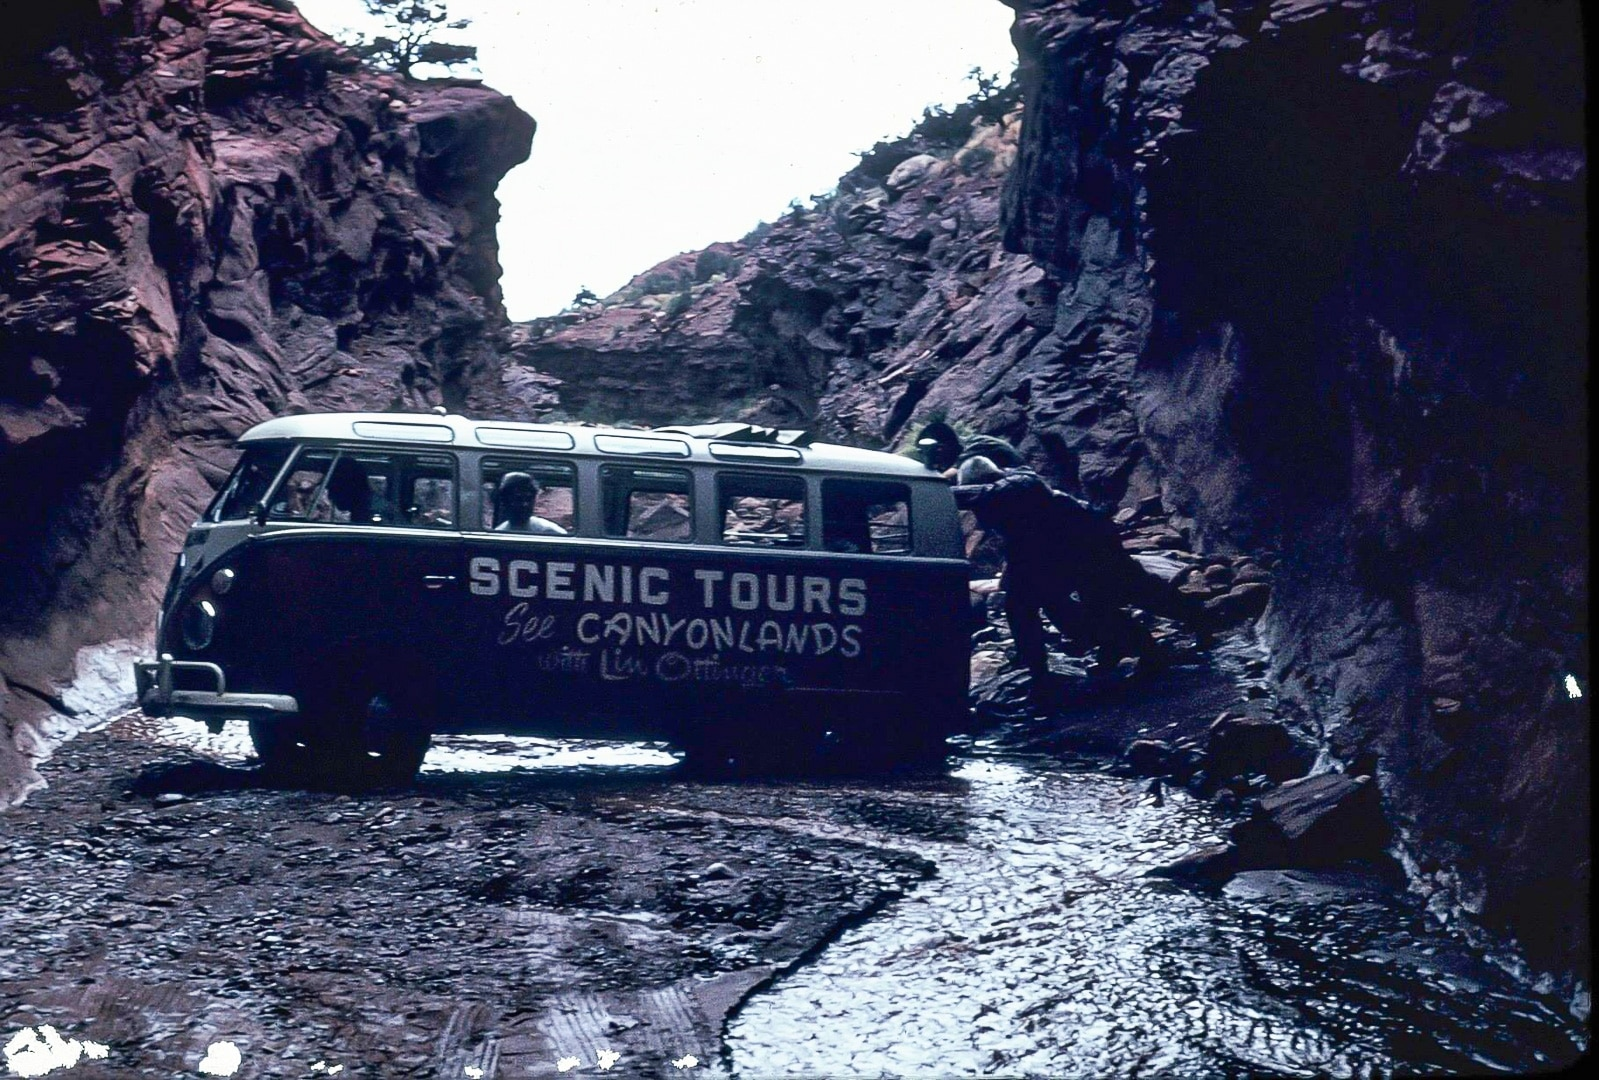 Lin Ottinger Canyon Land Scenic Tour VW Bus - BeCombi - Une-19